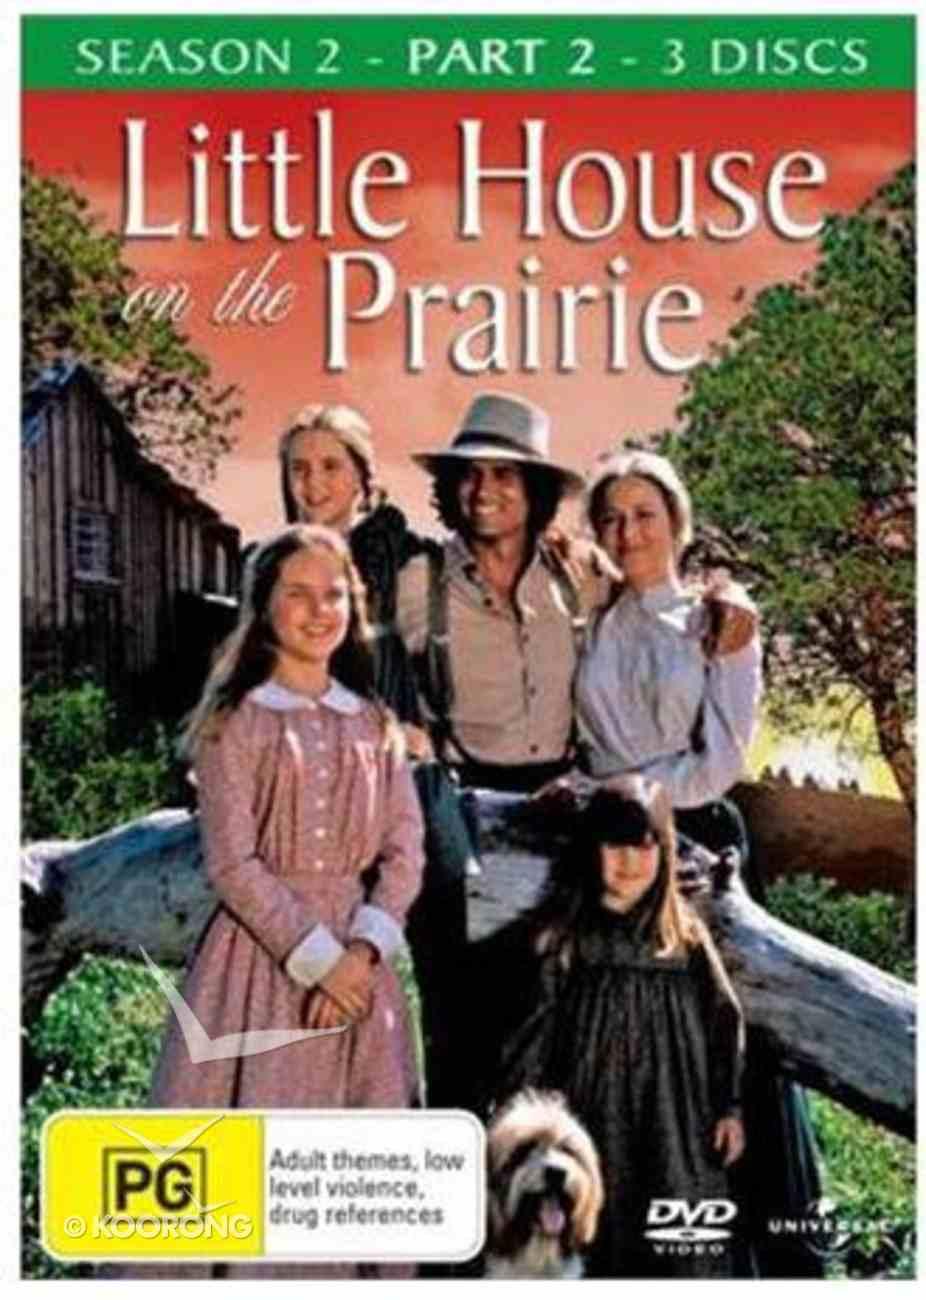 Season 2 Part 2 (3 Discs) (#2.2 in Little House On The Prairie Series) DVD